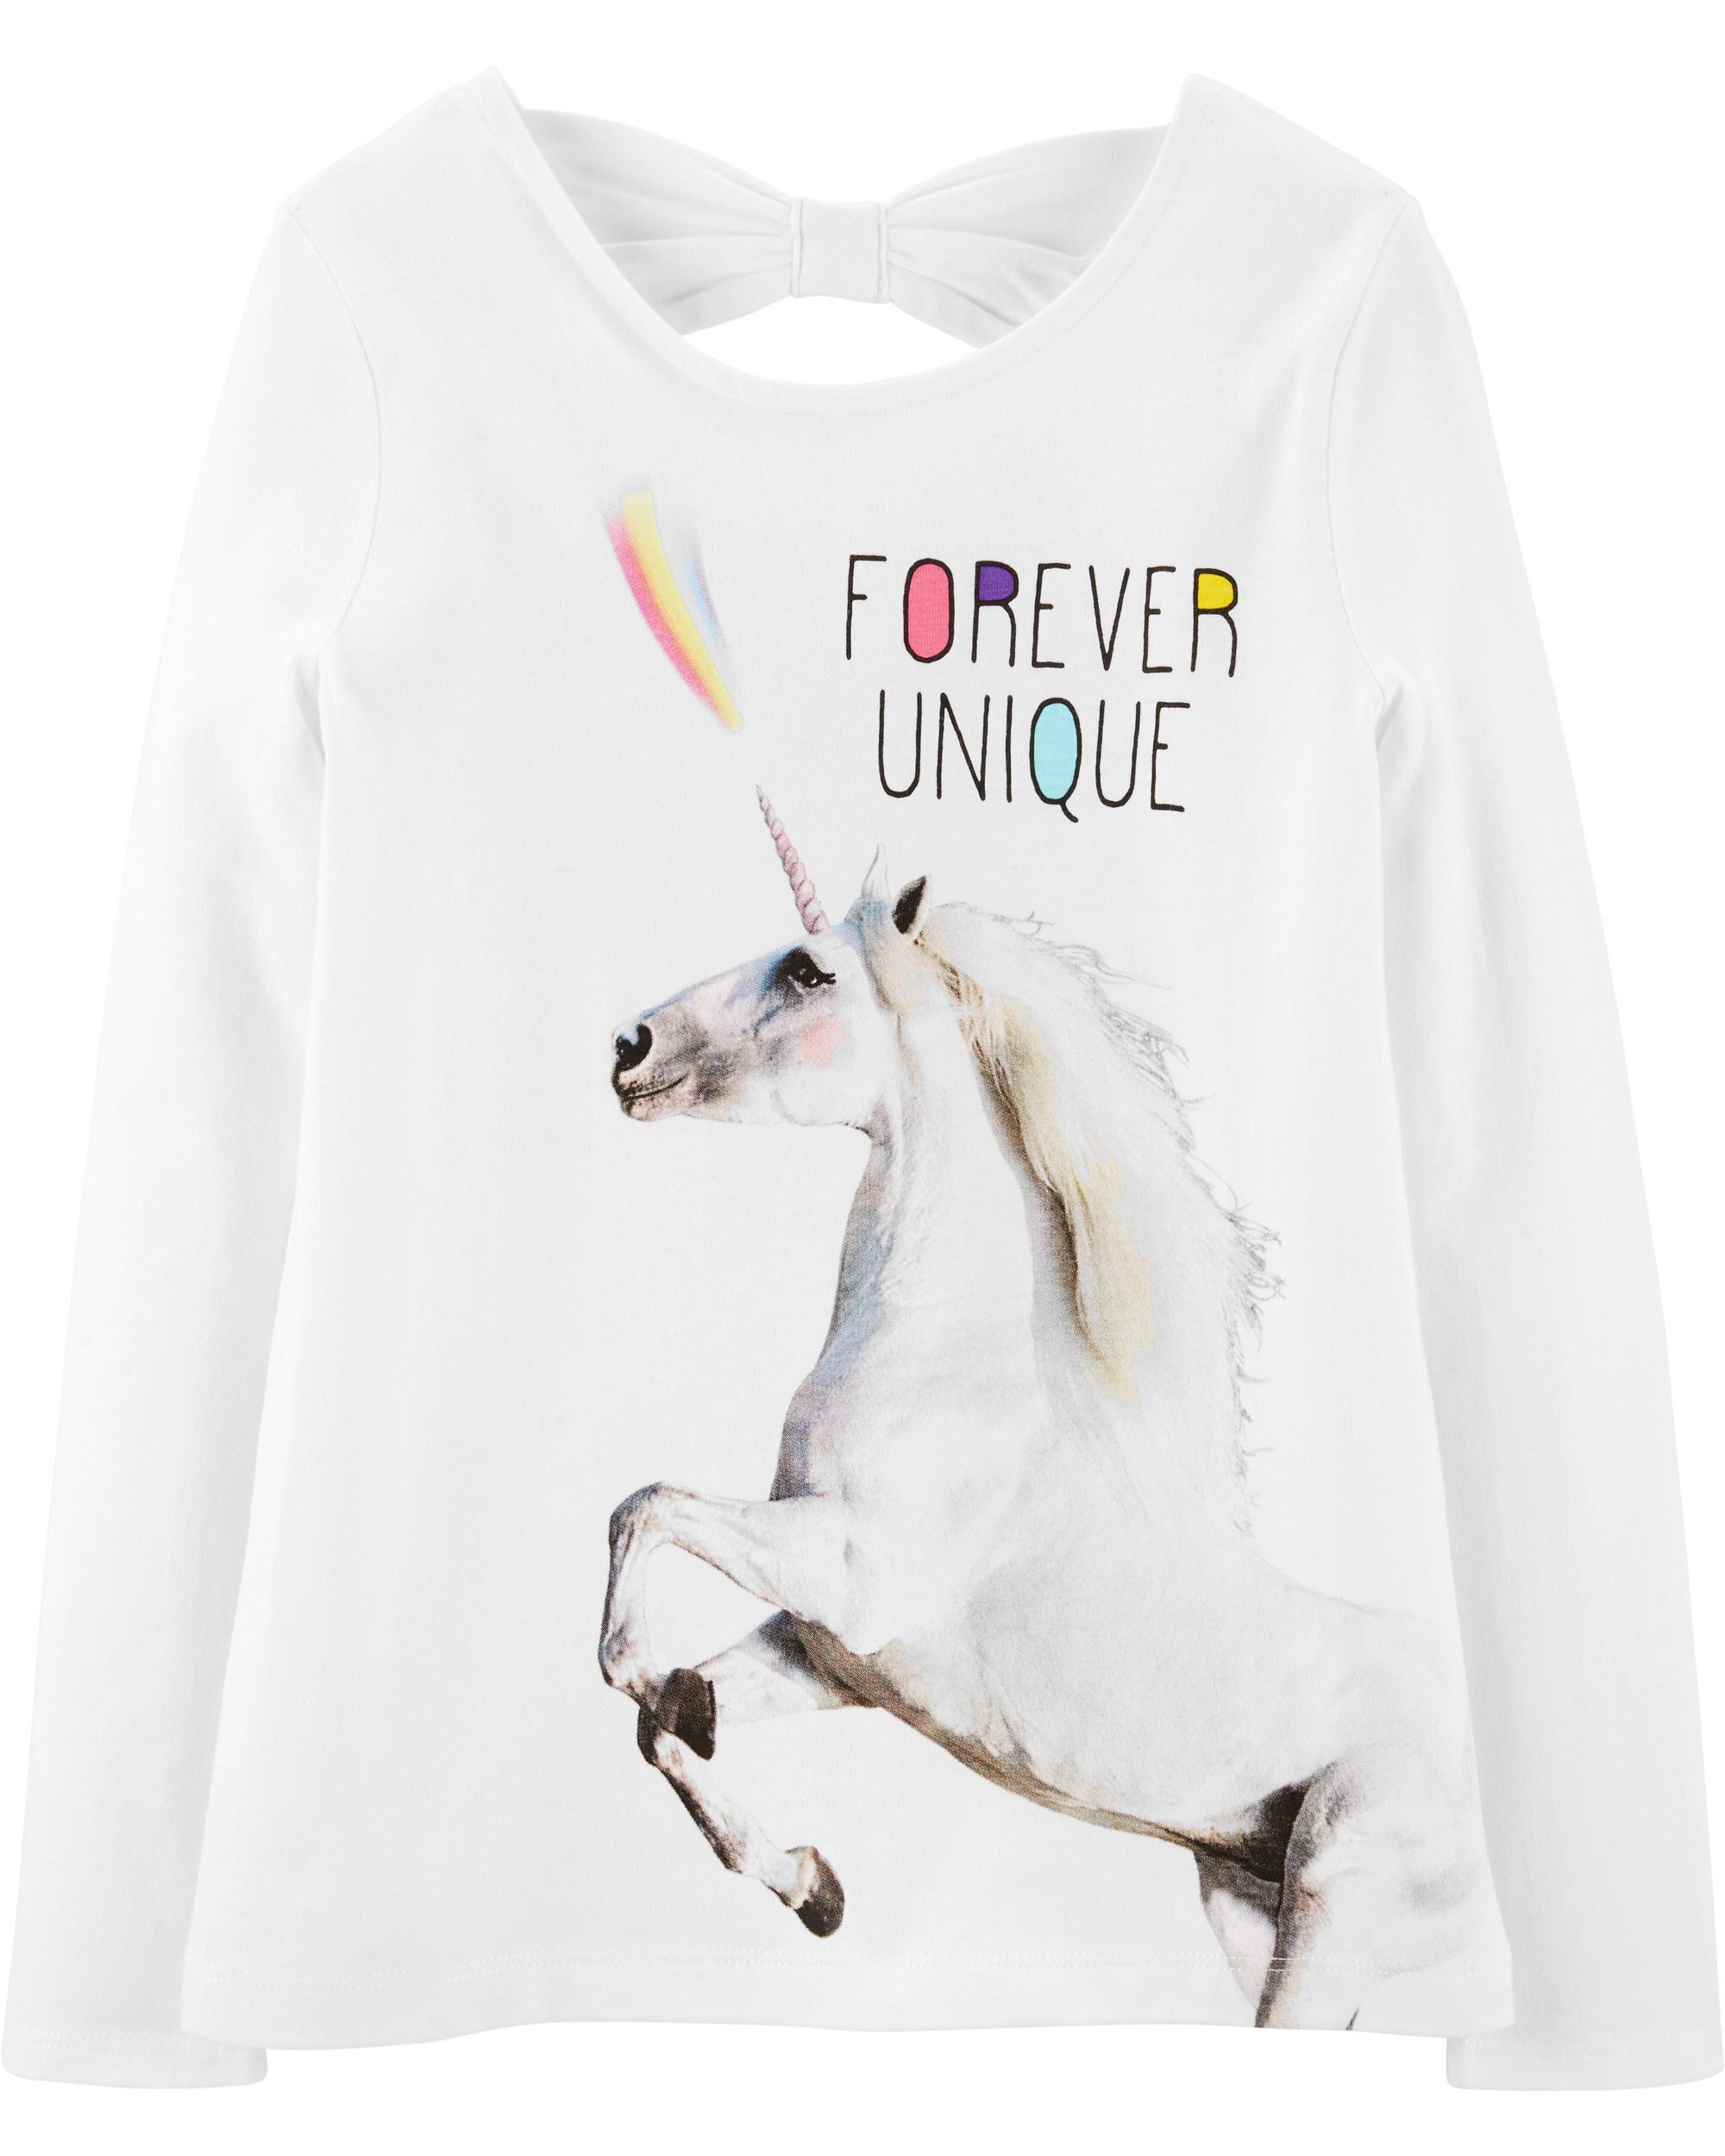 *DOORBUSTER*Unicorn Bow Back Jersey Tee